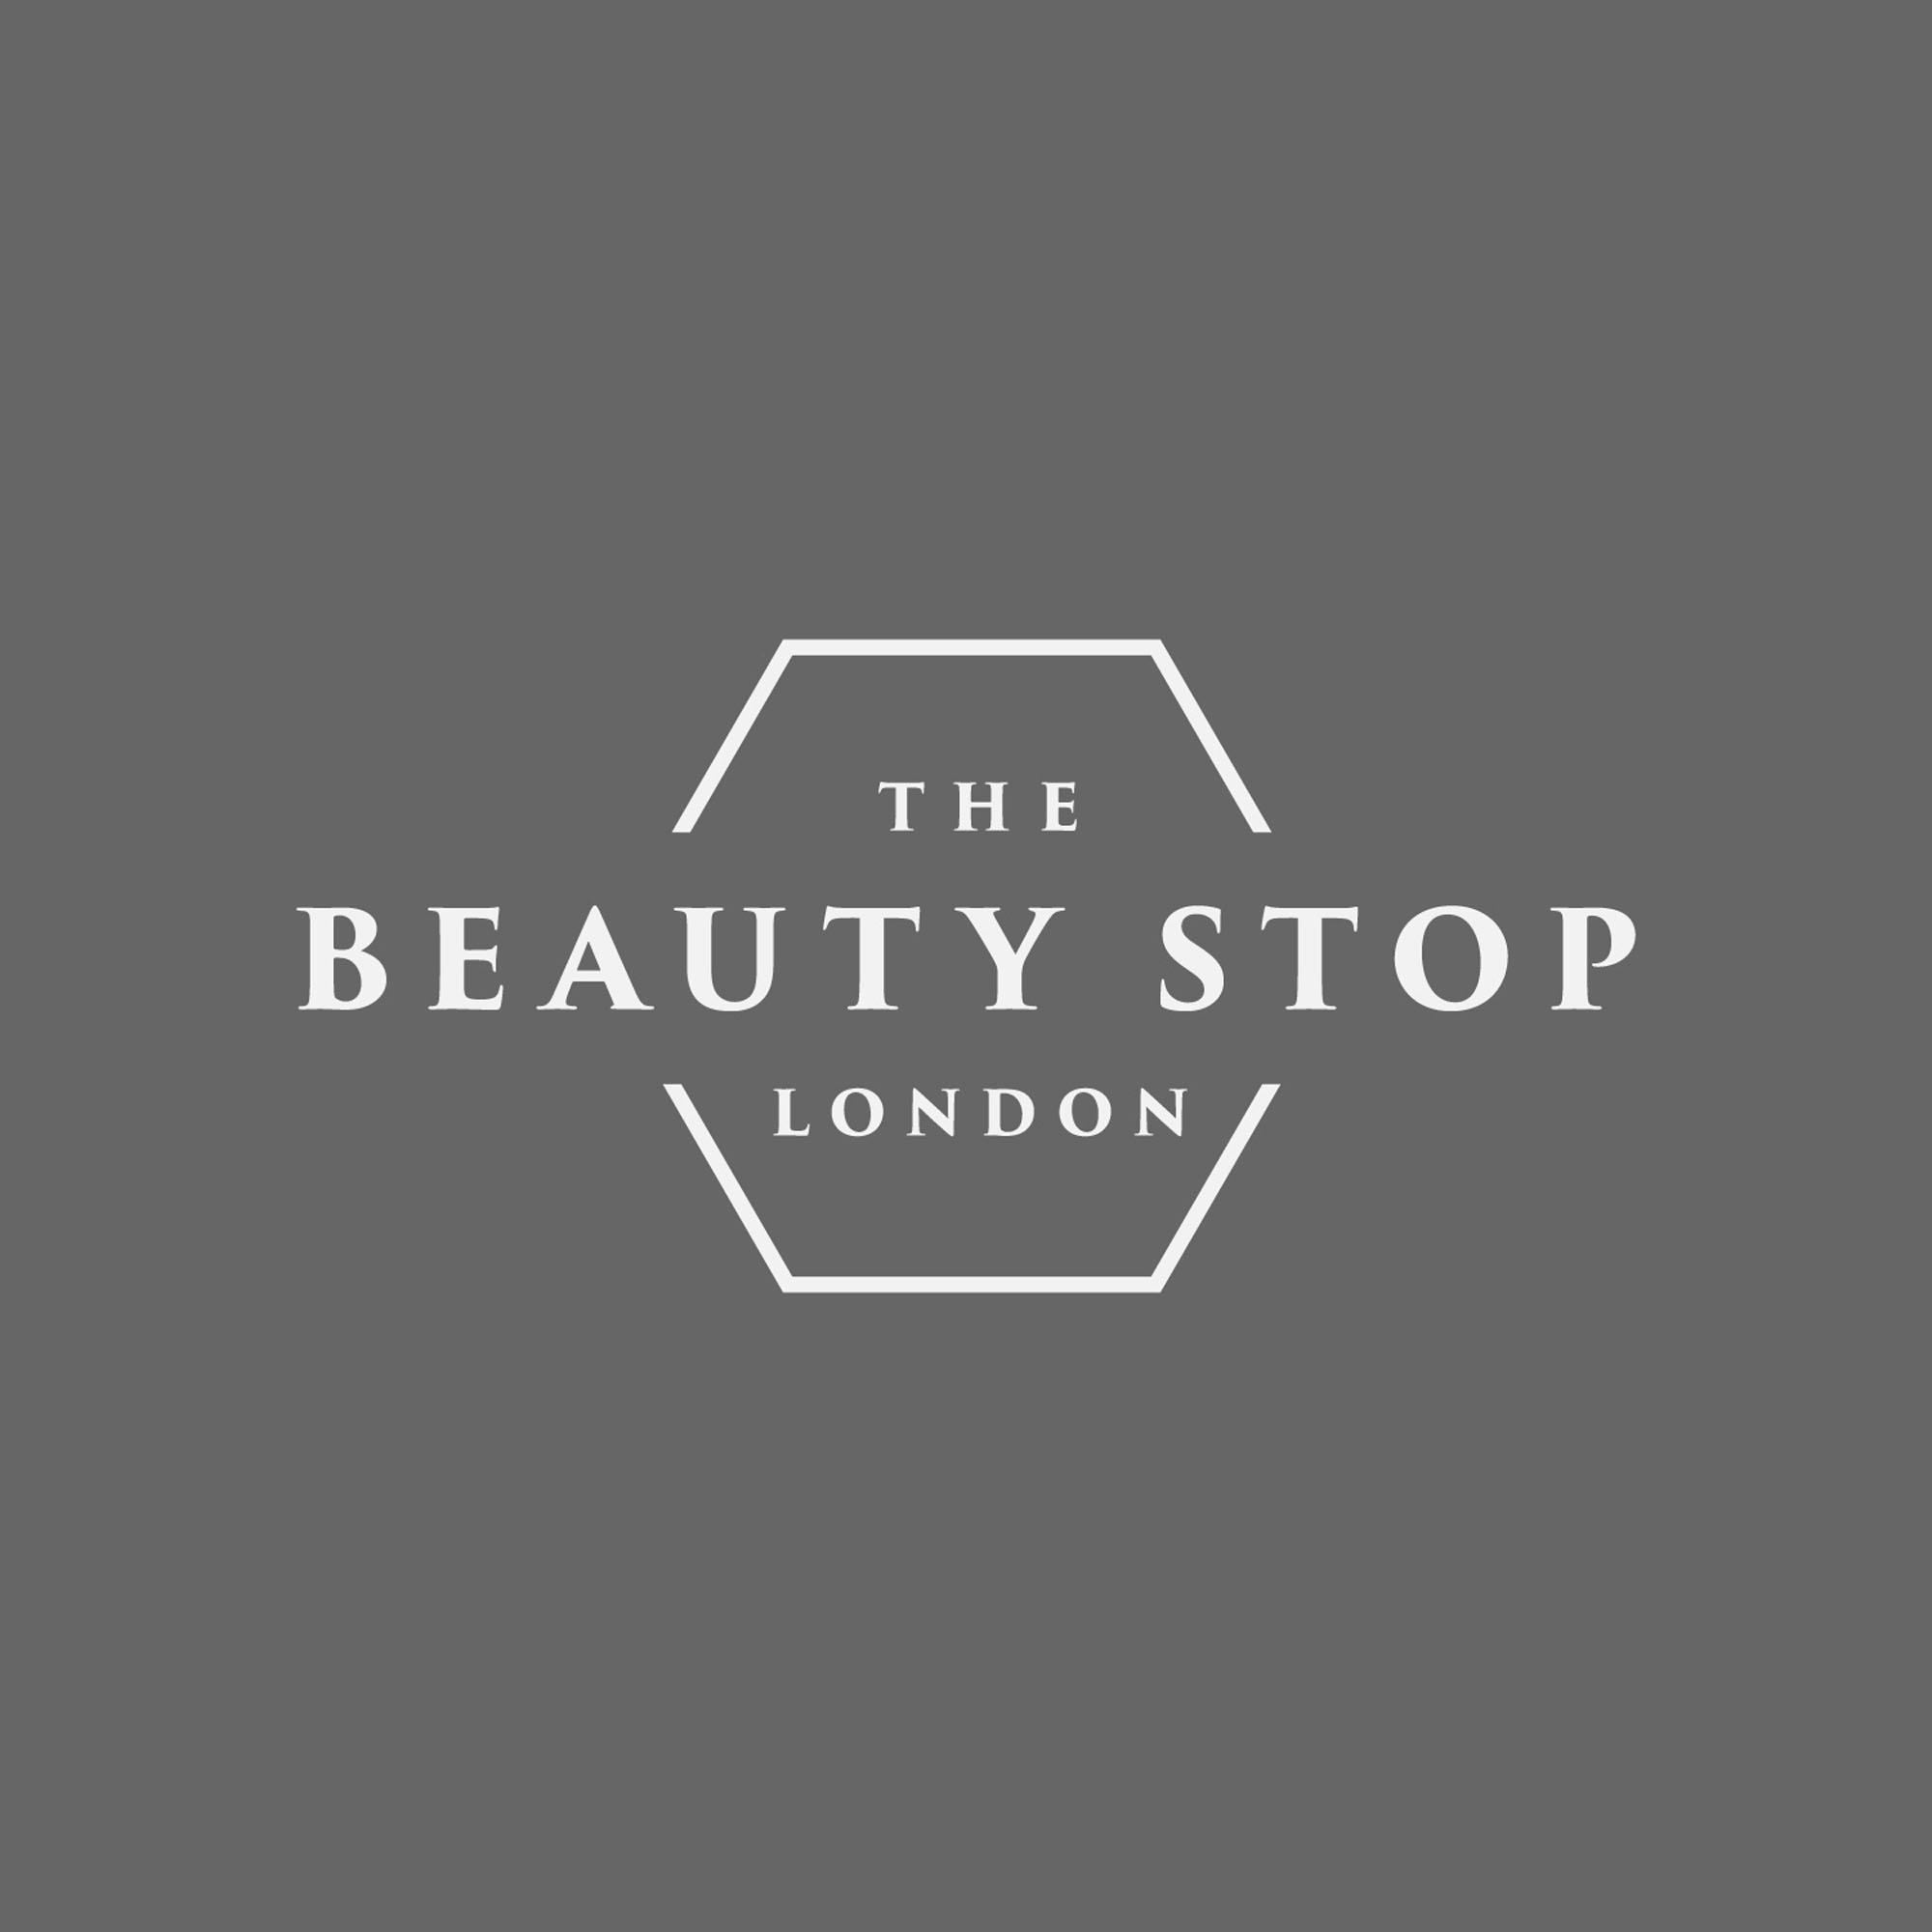 logo-designer-london-uk